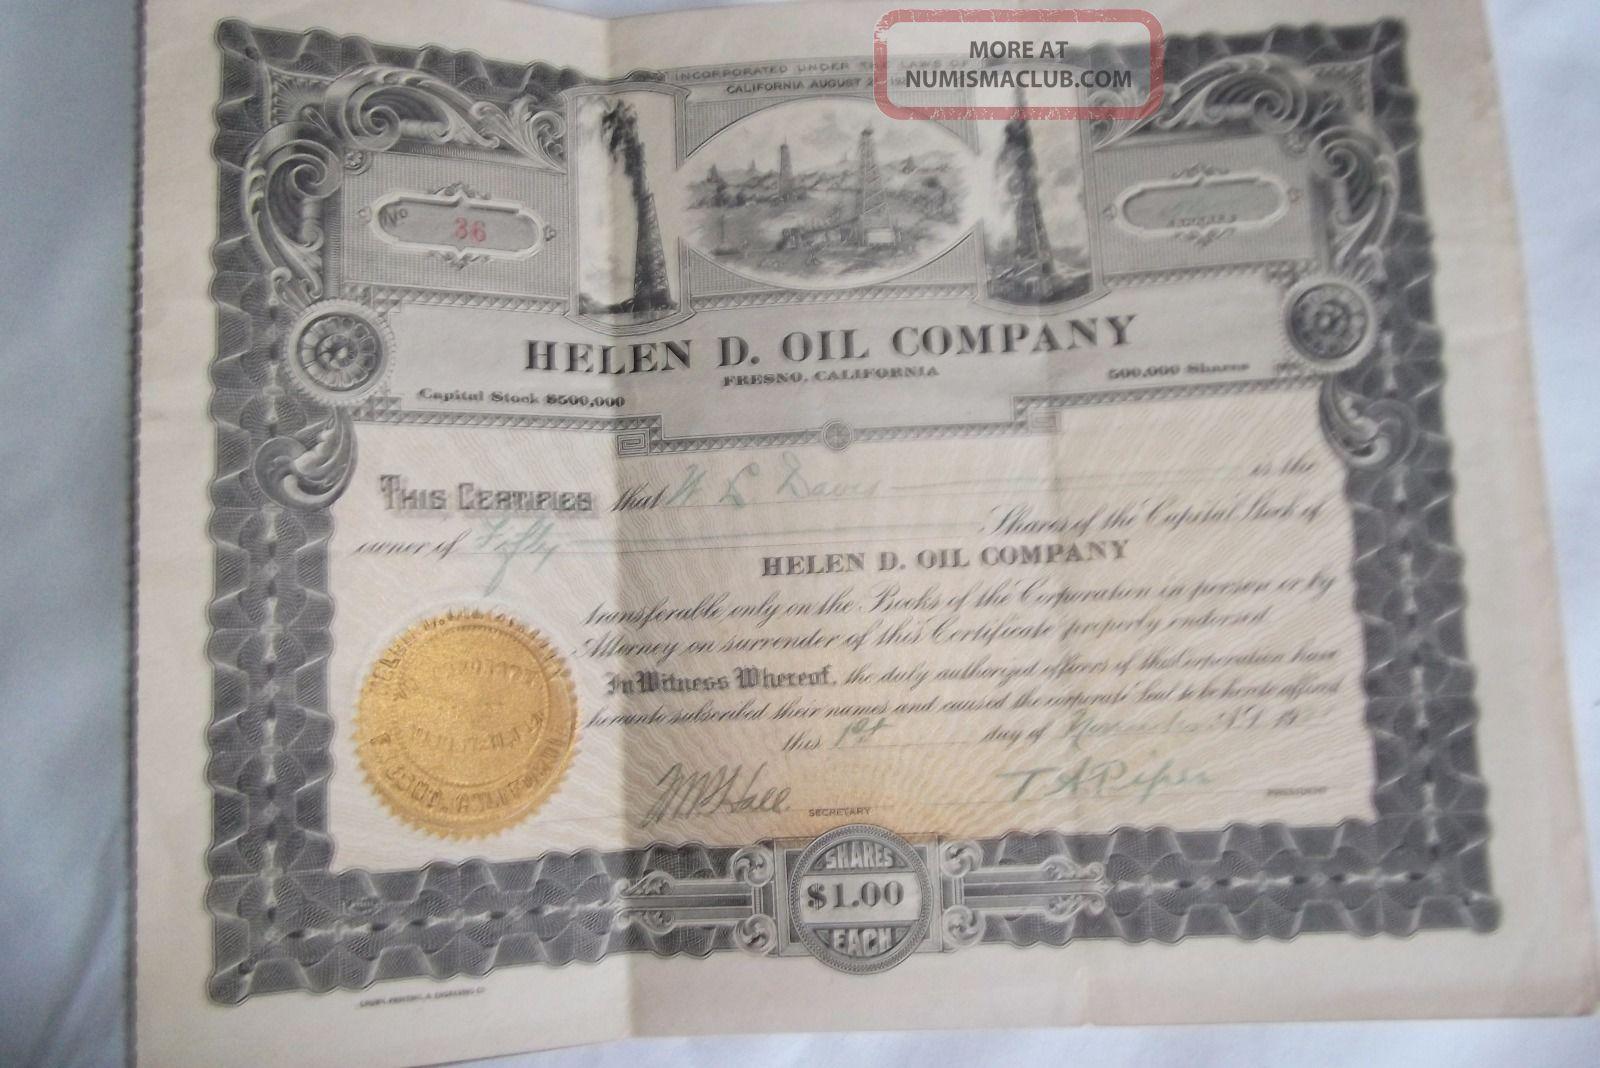 Helen D.  Oil Company,  Fresno,  California Stock Certificate - Issued 1921 - 50 Shares Stocks & Bonds, Scripophily photo